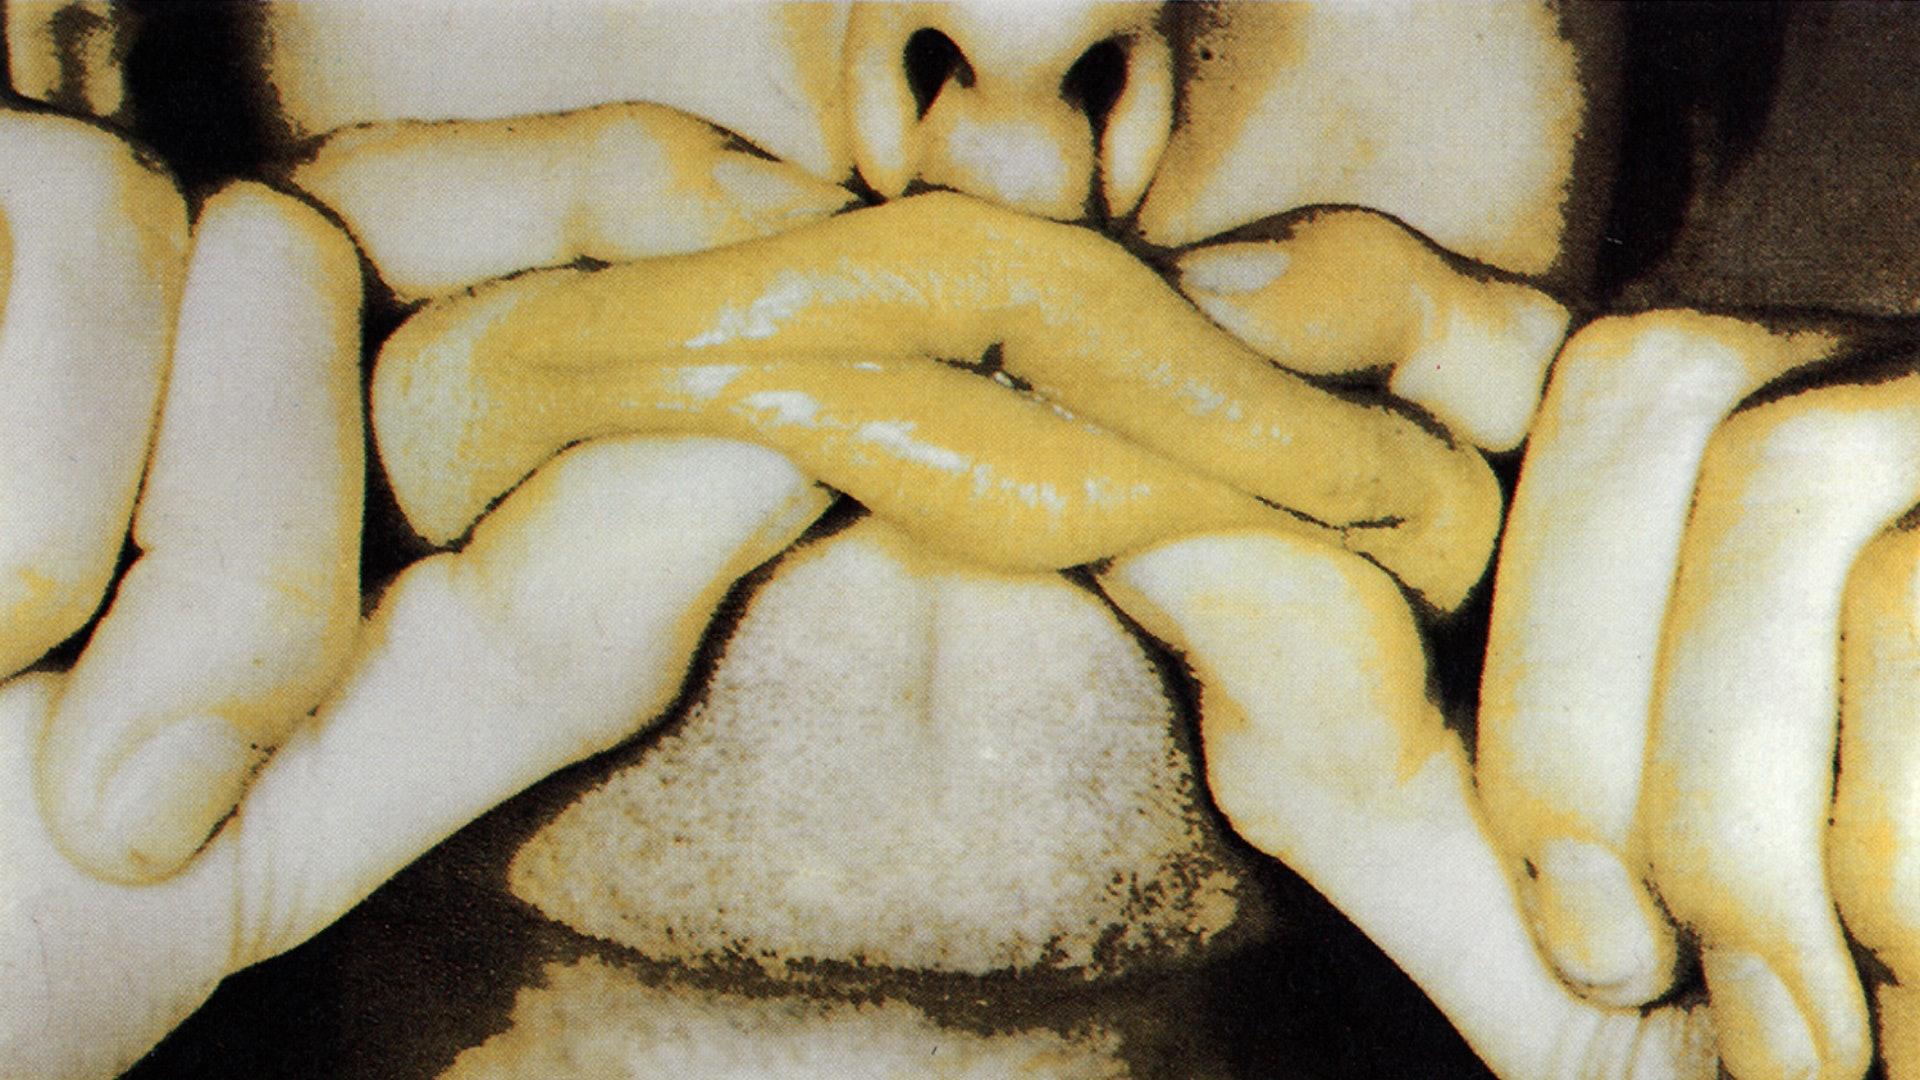 Брюс Науман, Исследования для голограмм (а), 1970, Коллекция Stedelijk Museum Amsterdam. © 2021 Брюс Науман: Общество прав художников (ARS), любезно предоставлено Sperone Westwater, Нью-Йорк. © 2021 Брюс Науман: Pictoright Amsterdam